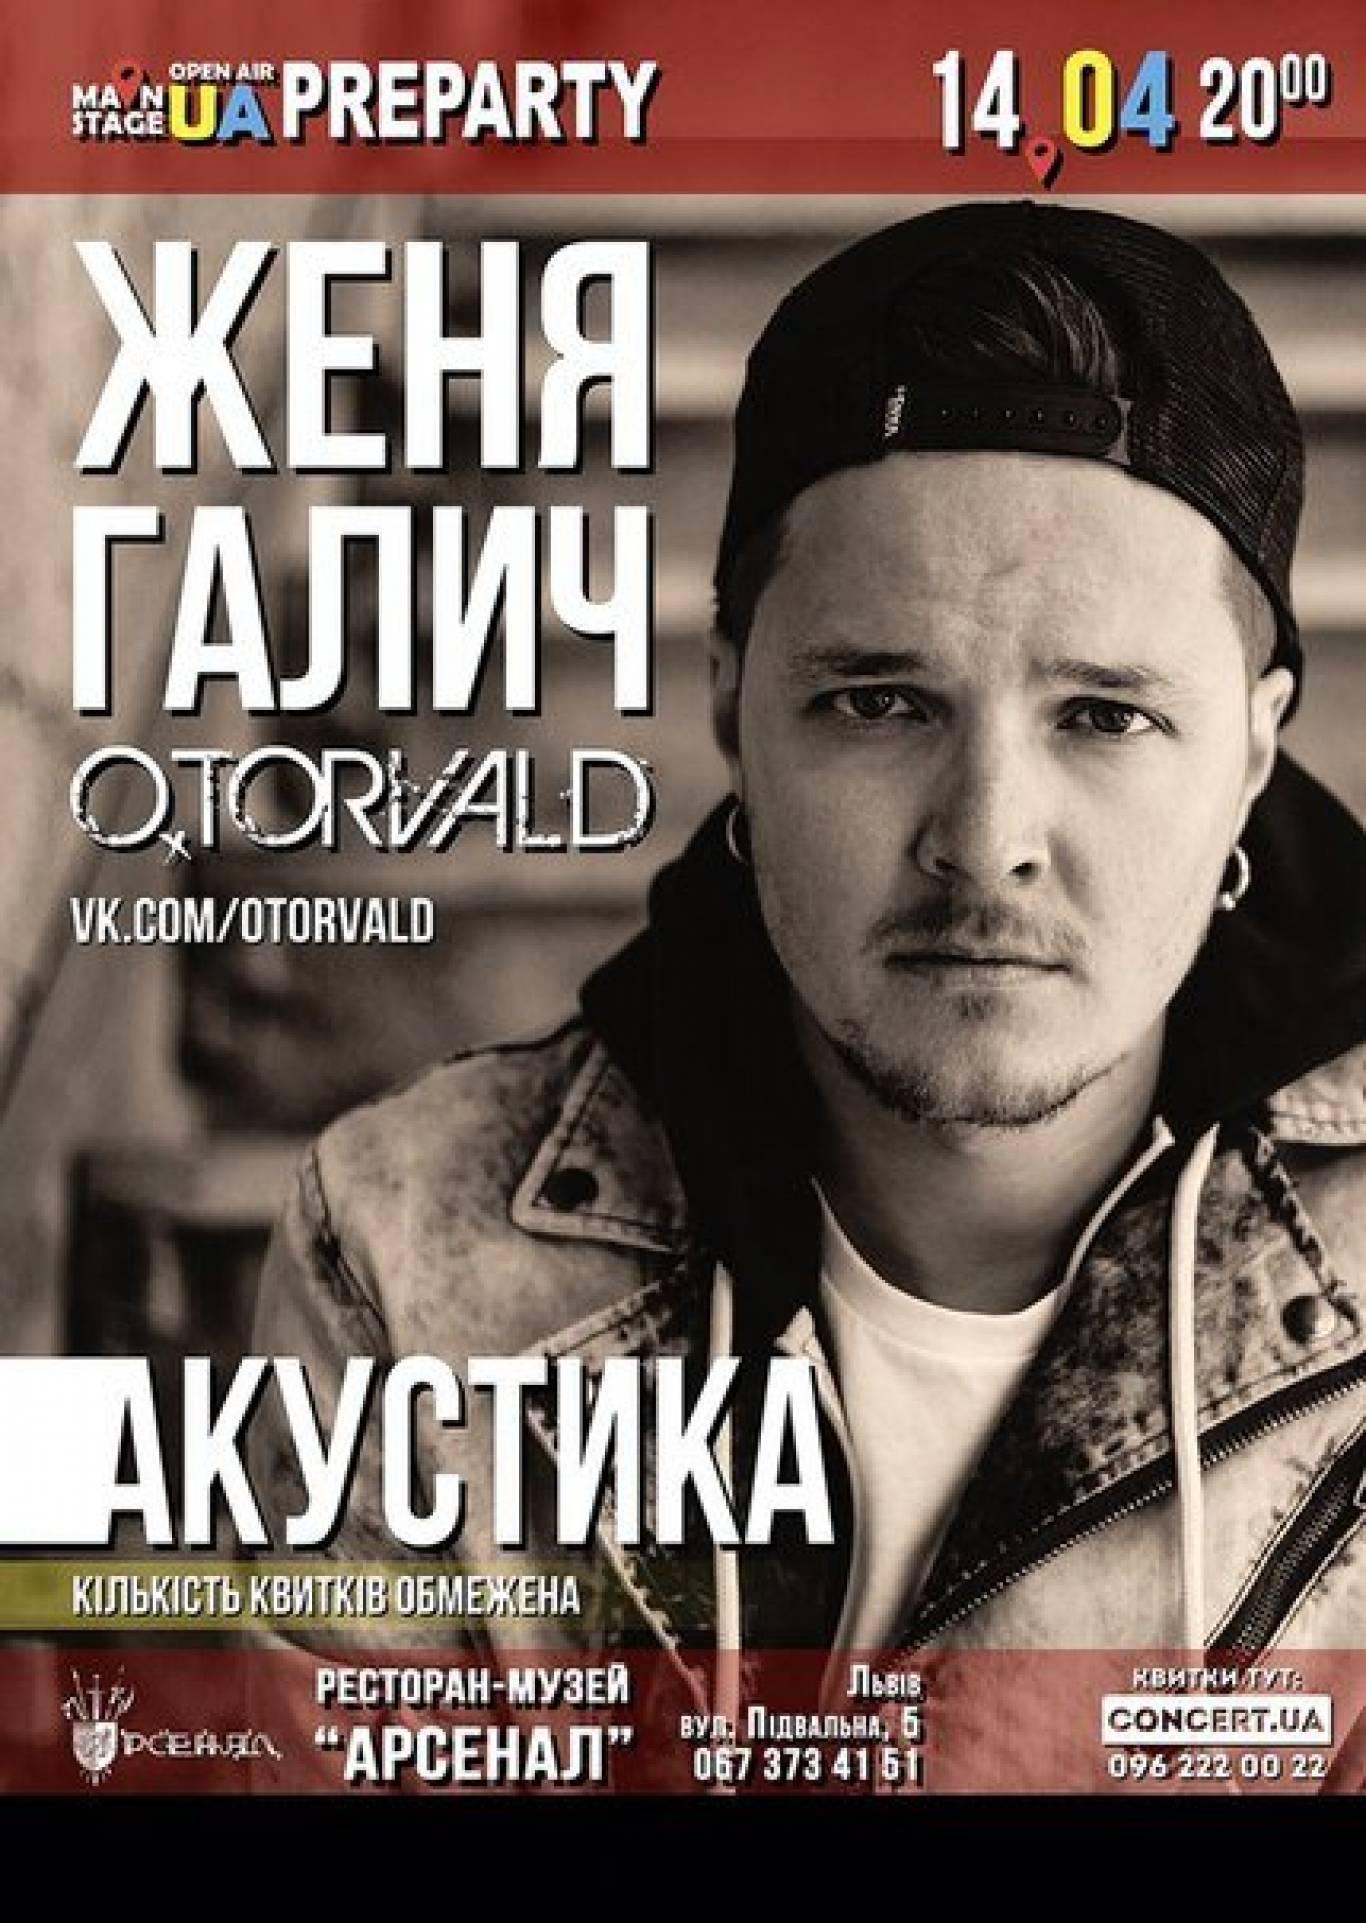 "Концерт ""Mainstage UA Preparty: Женя Галич"""